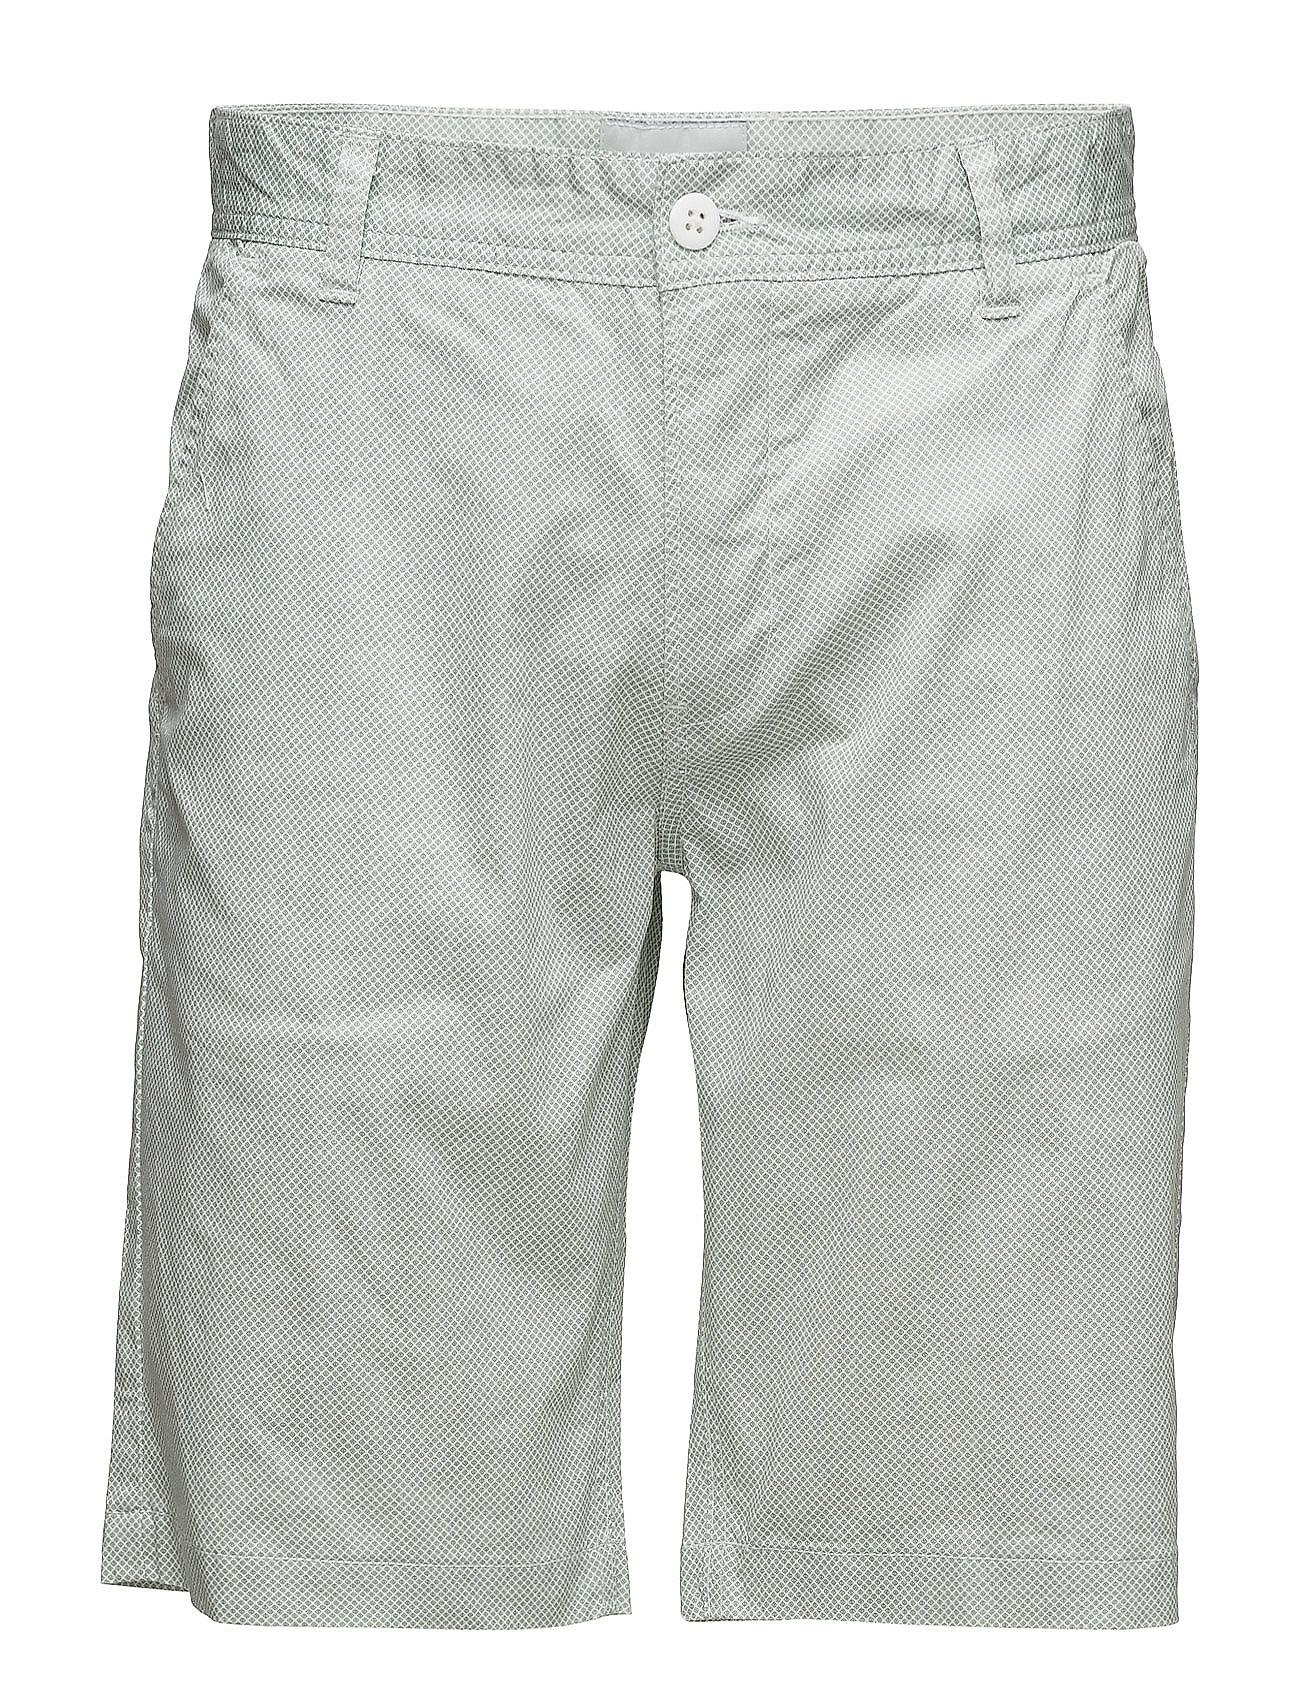 Spearmint Bruun & Stengade Bermuda shorts til Herrer i